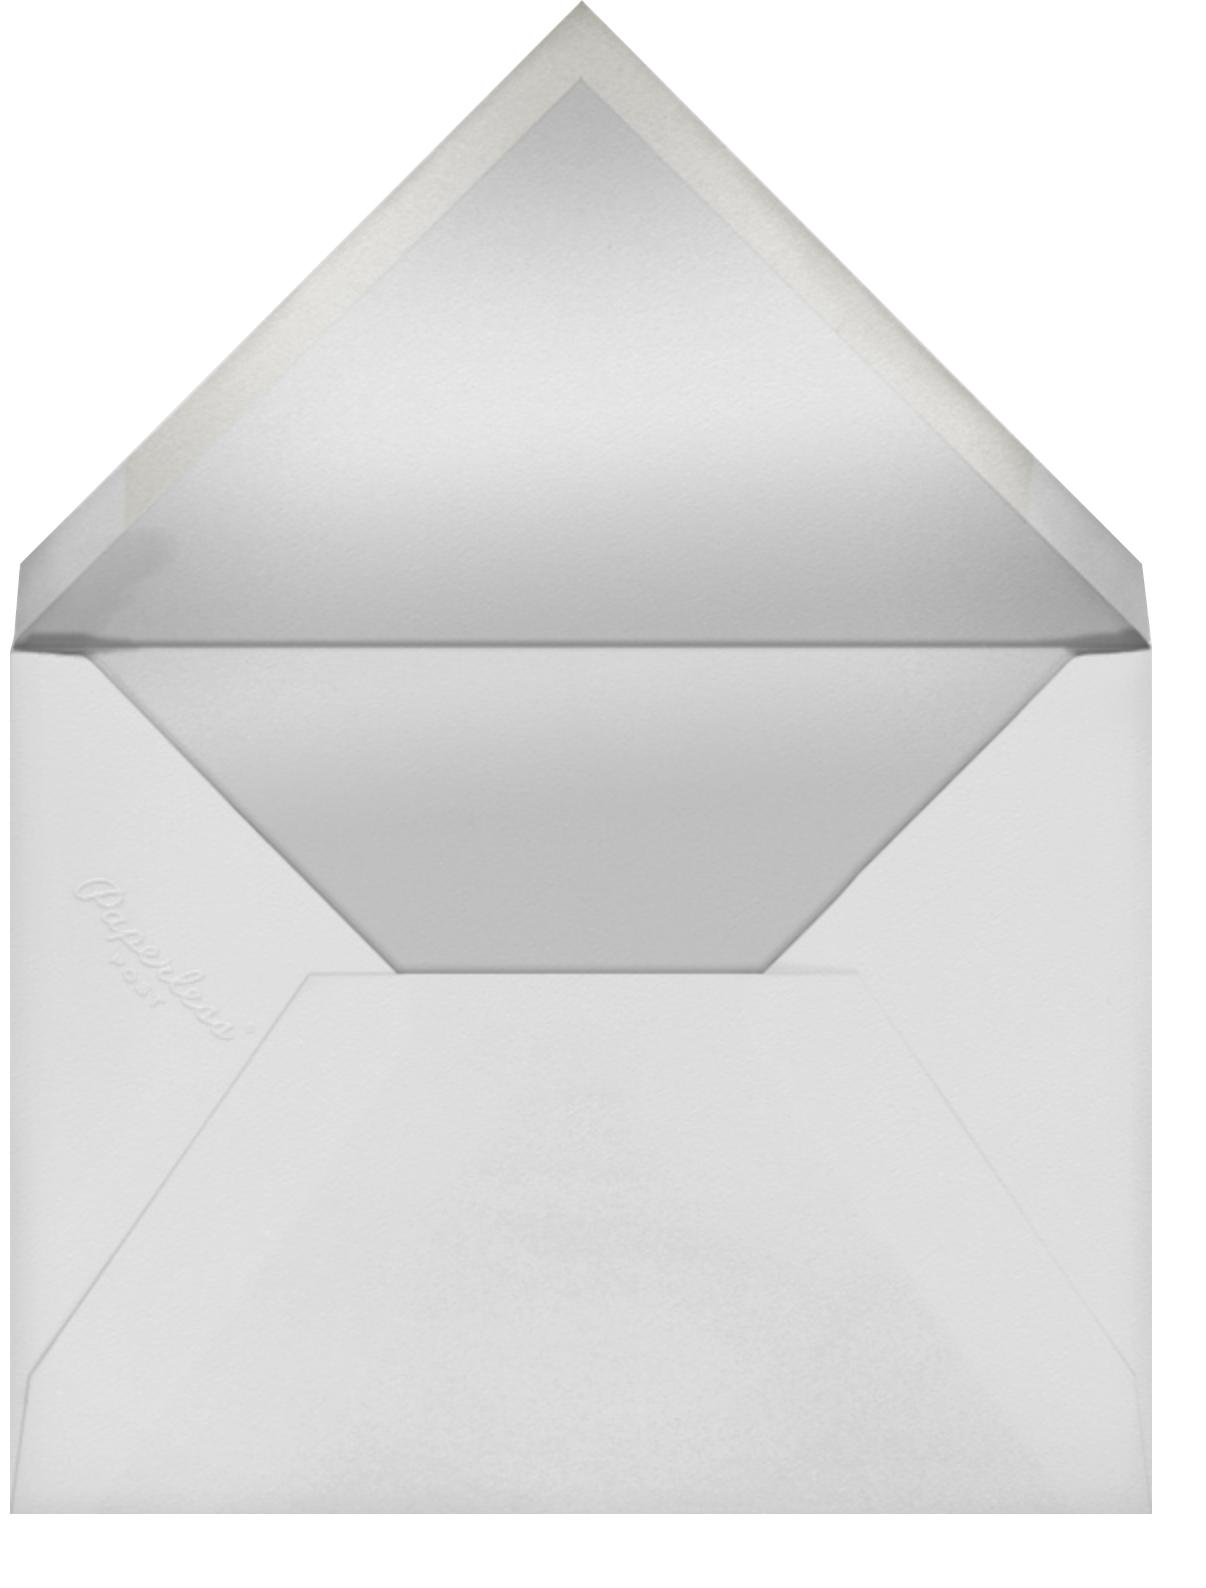 Teablossom (Program) - Paperless Post - Menus and programs - envelope back